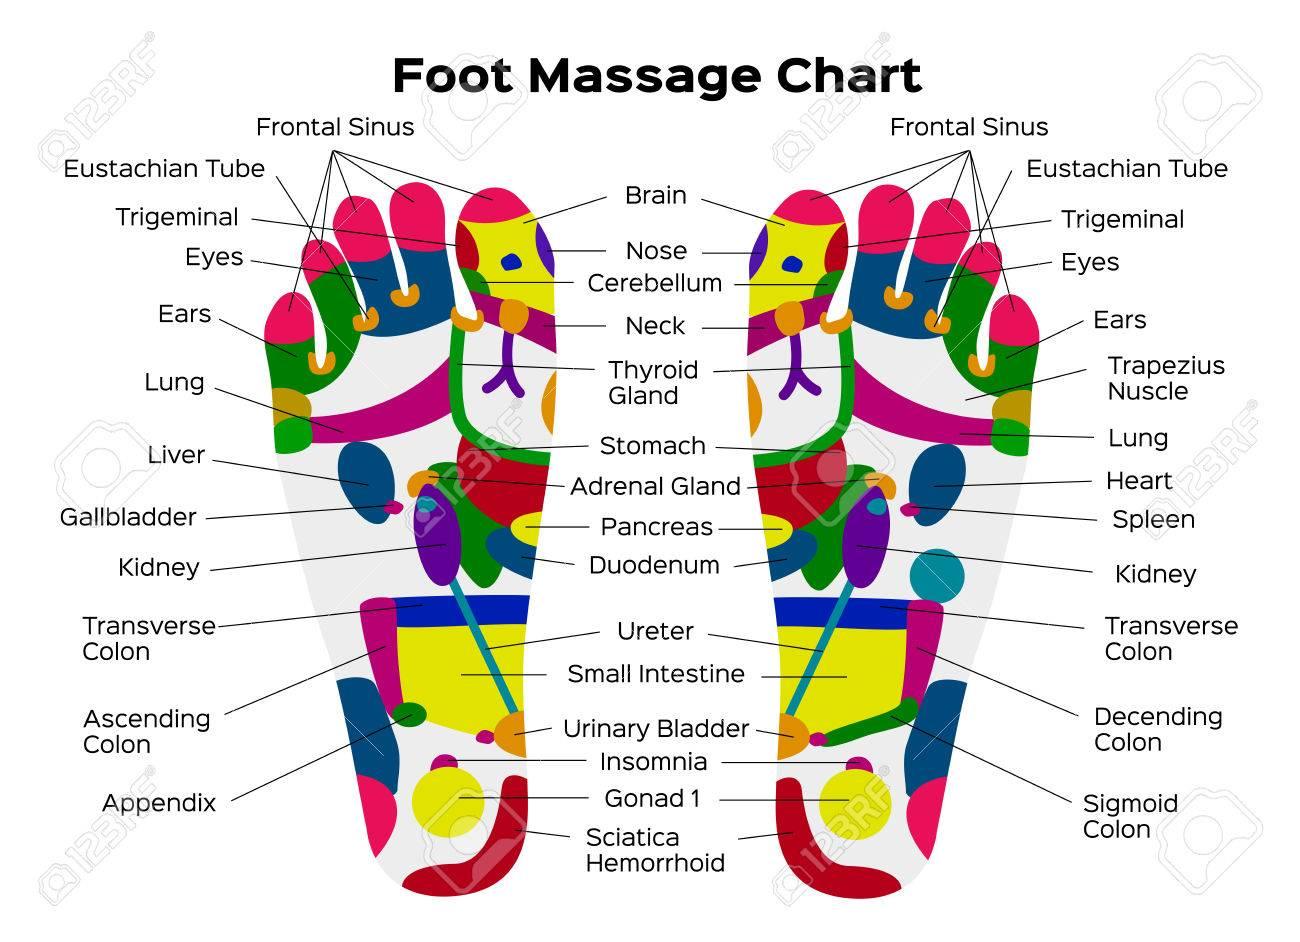 Vektorgrafik Illustration: Fußreflexzonenmassage Diagramm Mit ...